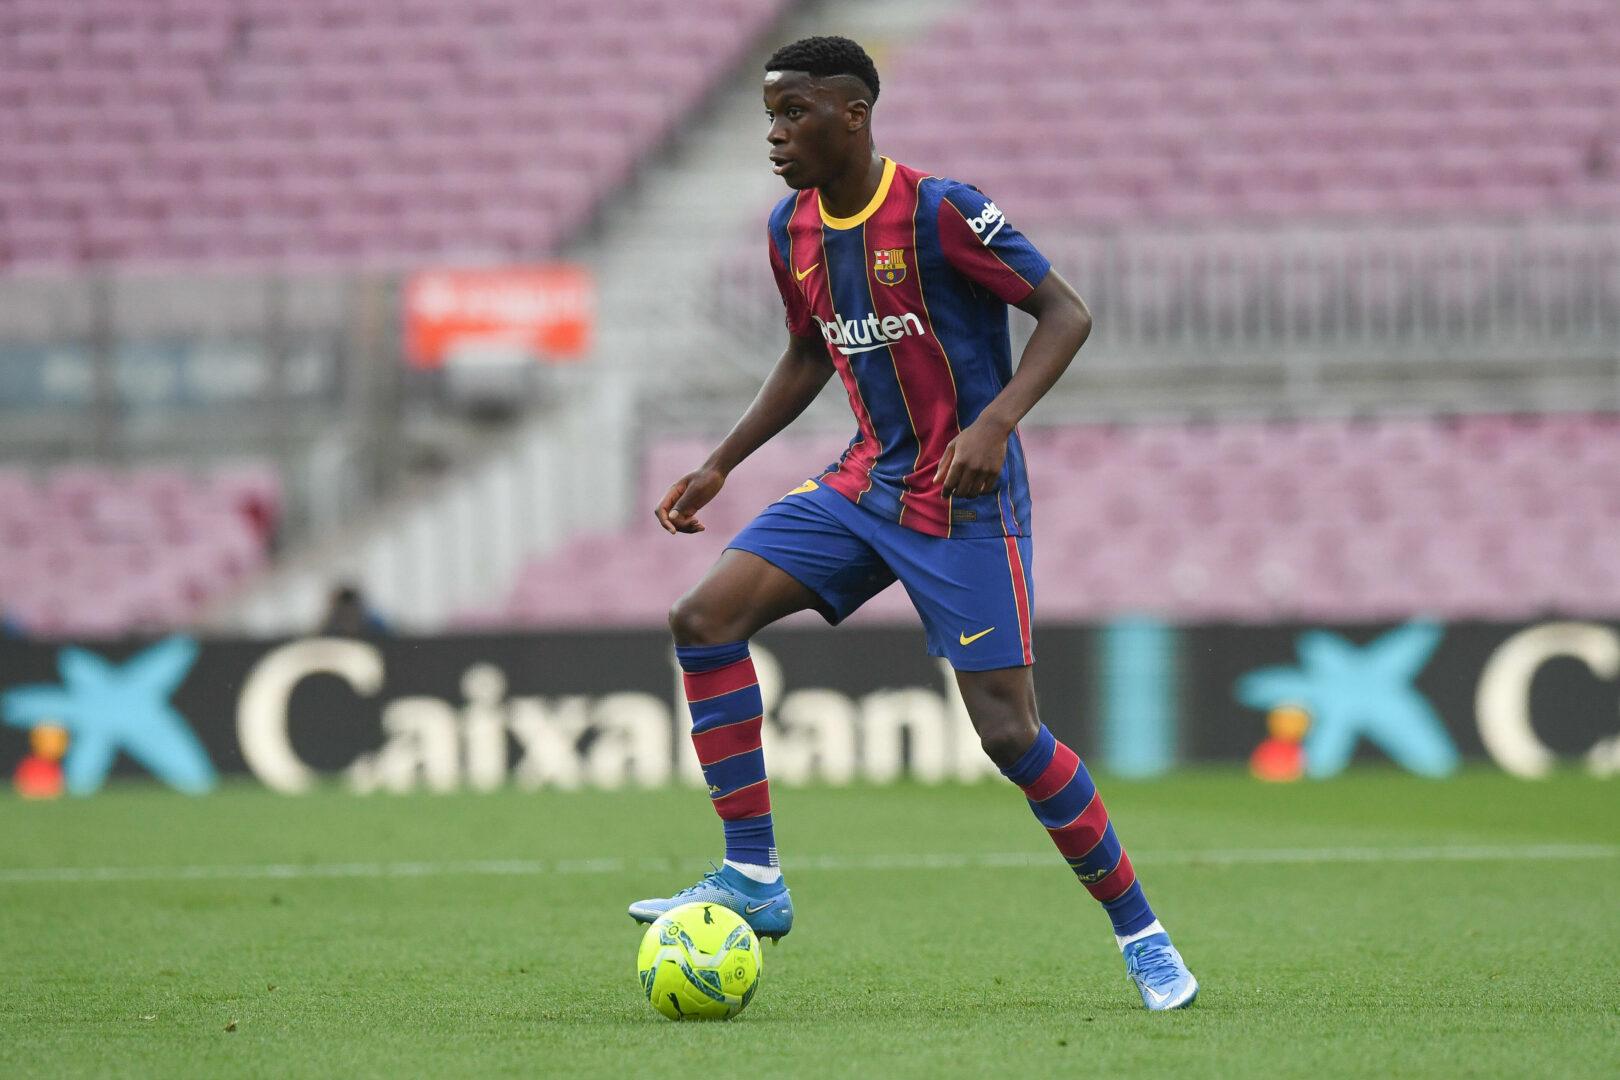 Moriba (FC Barcelona) im Dribbling